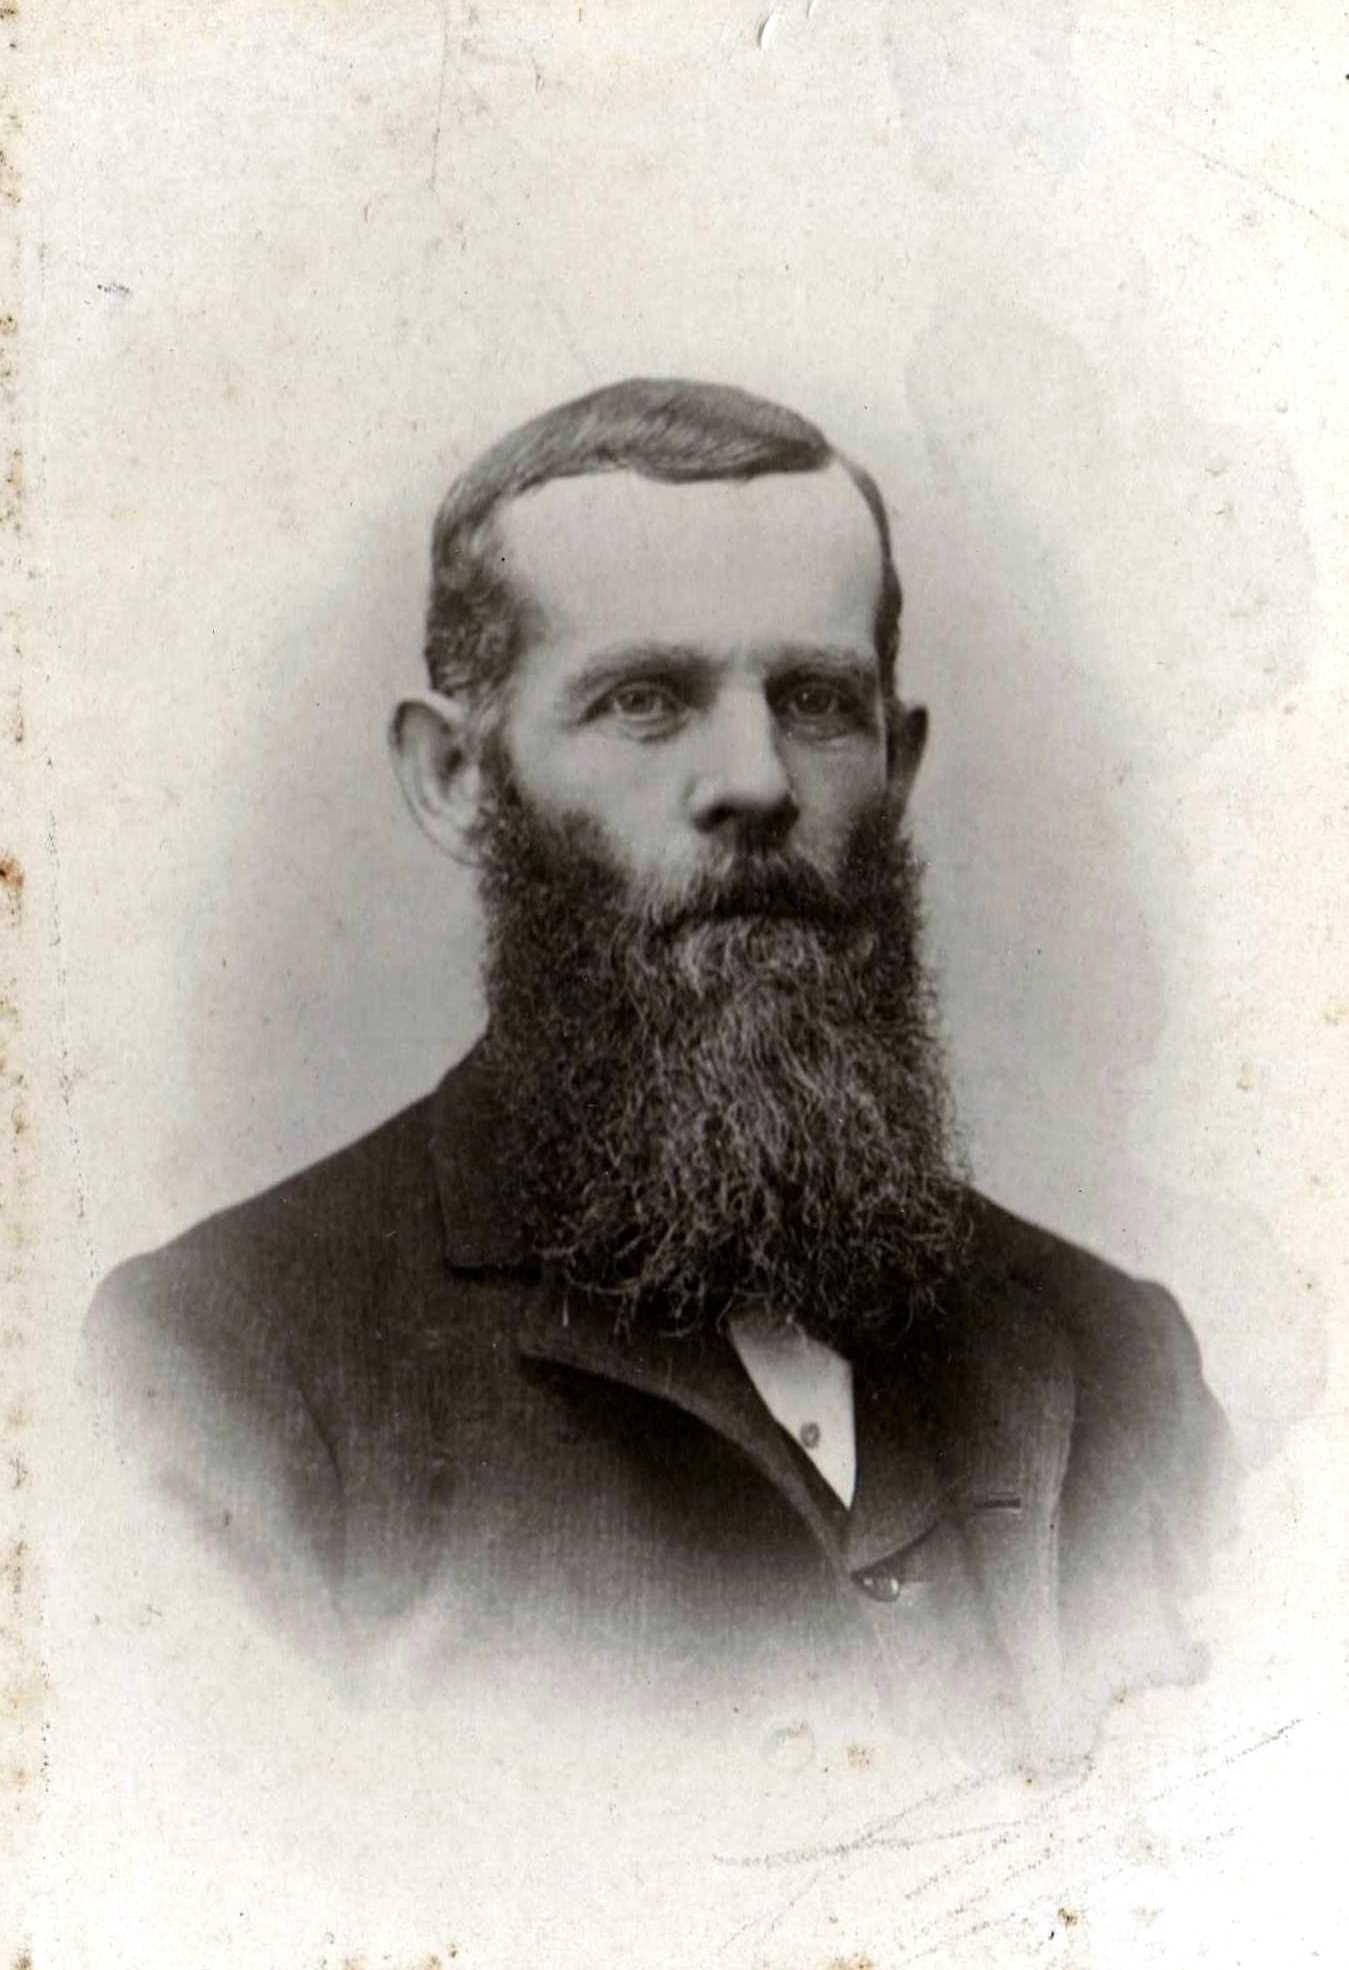 Davis Enyeart (1837-1905)